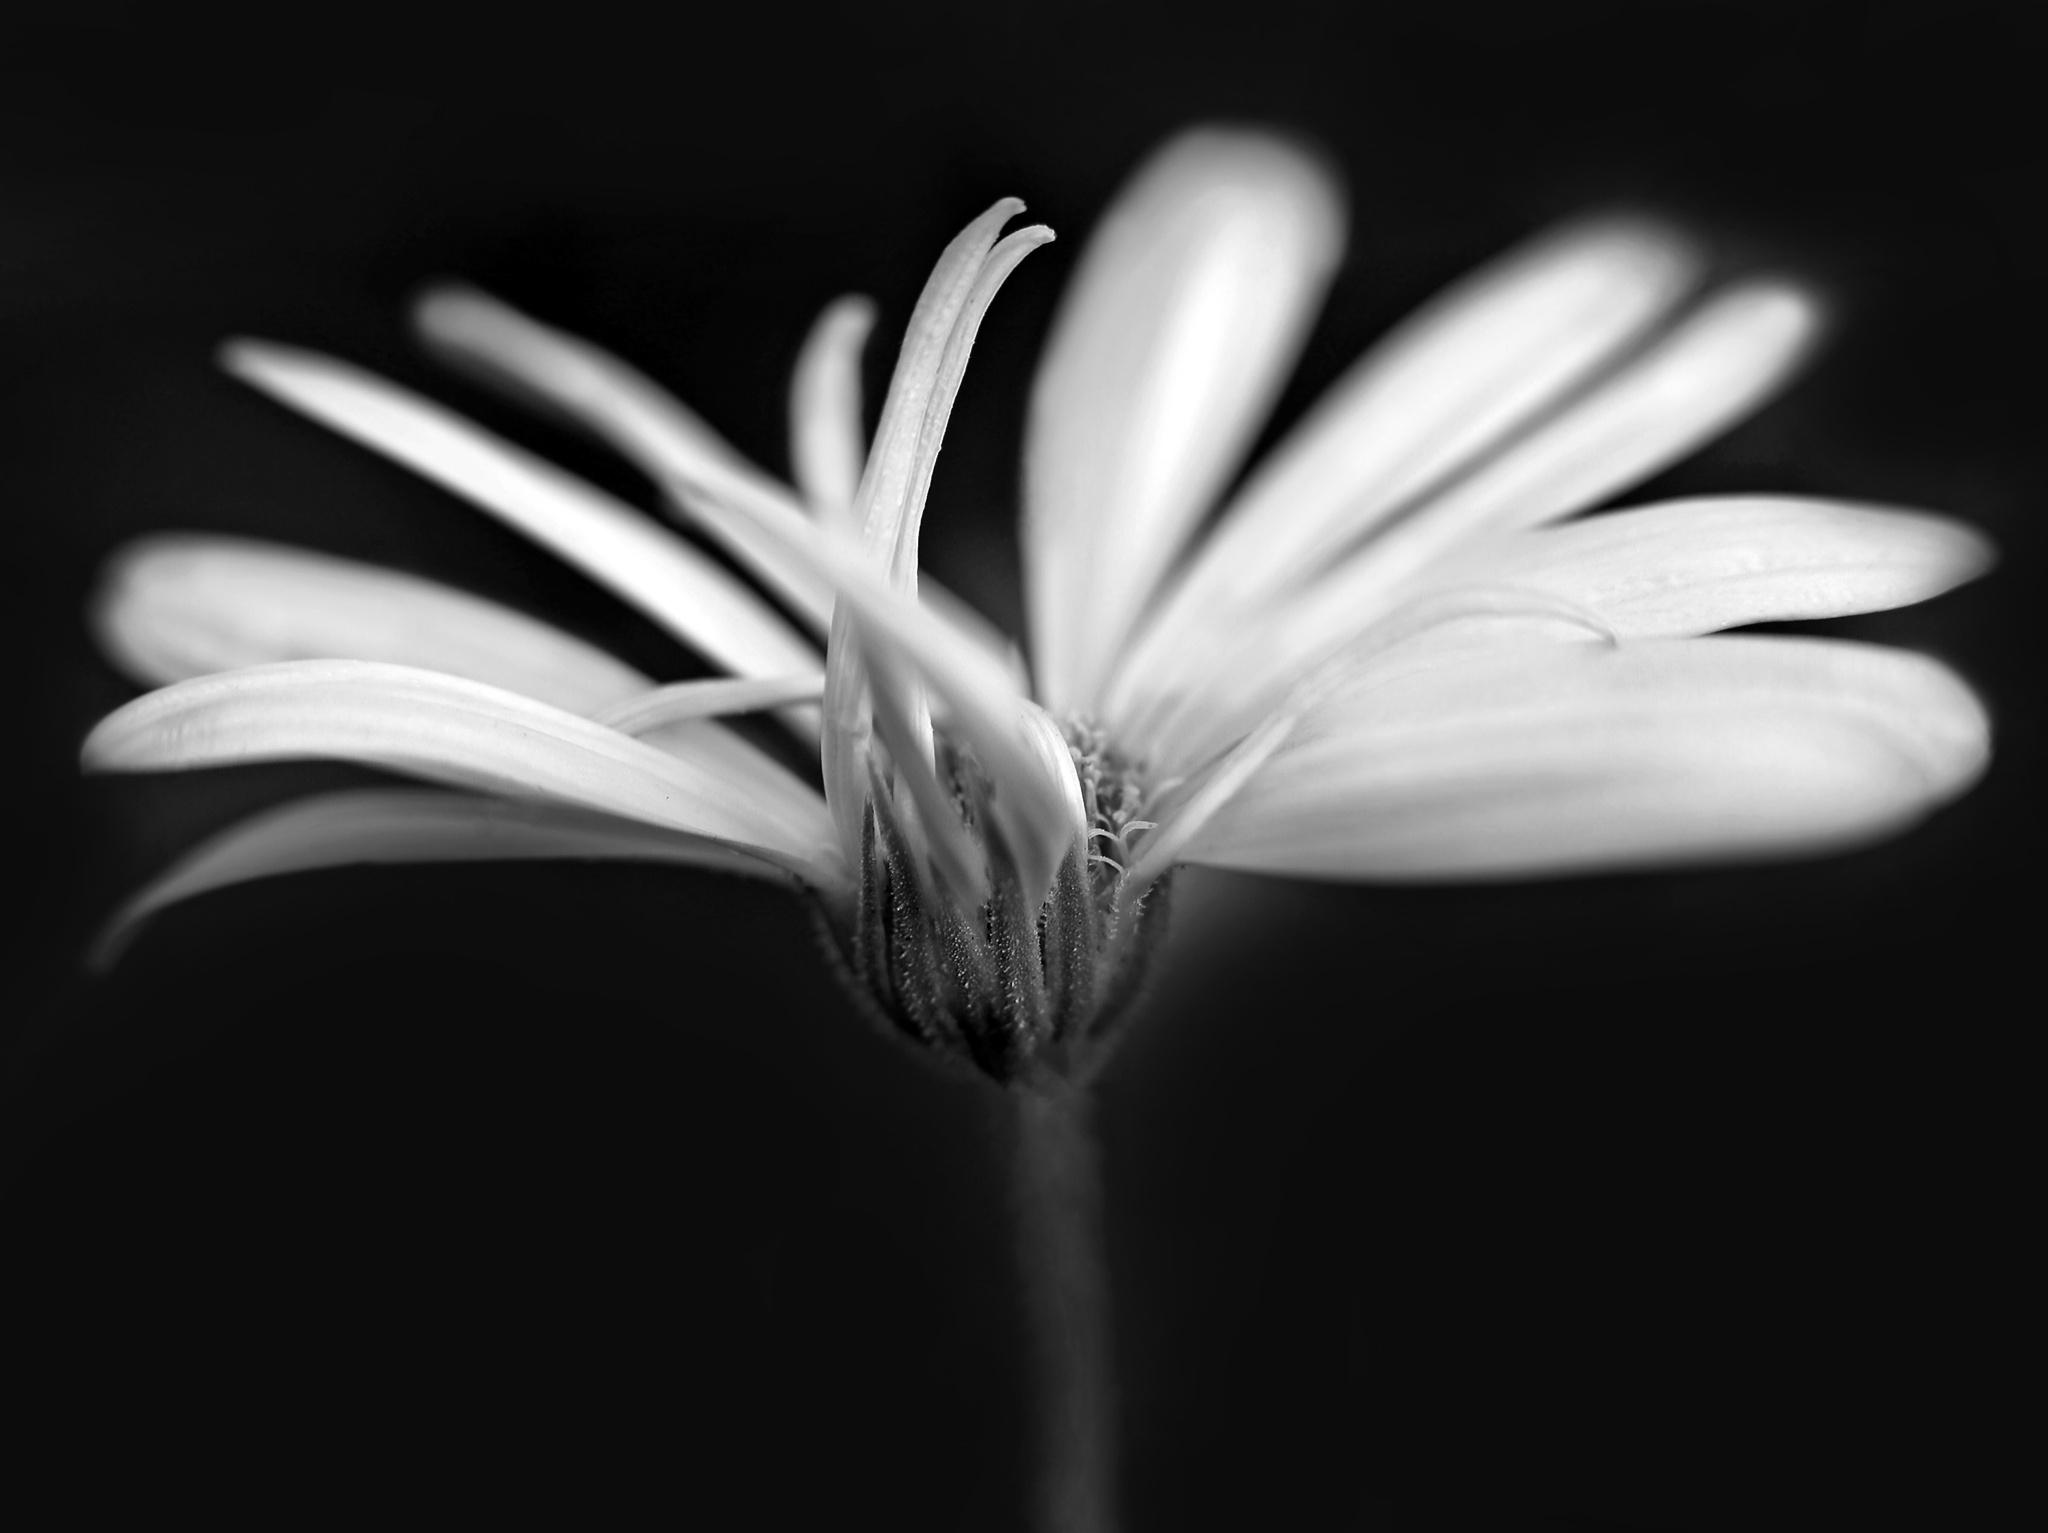 Flowers 098 by susan.burger.10